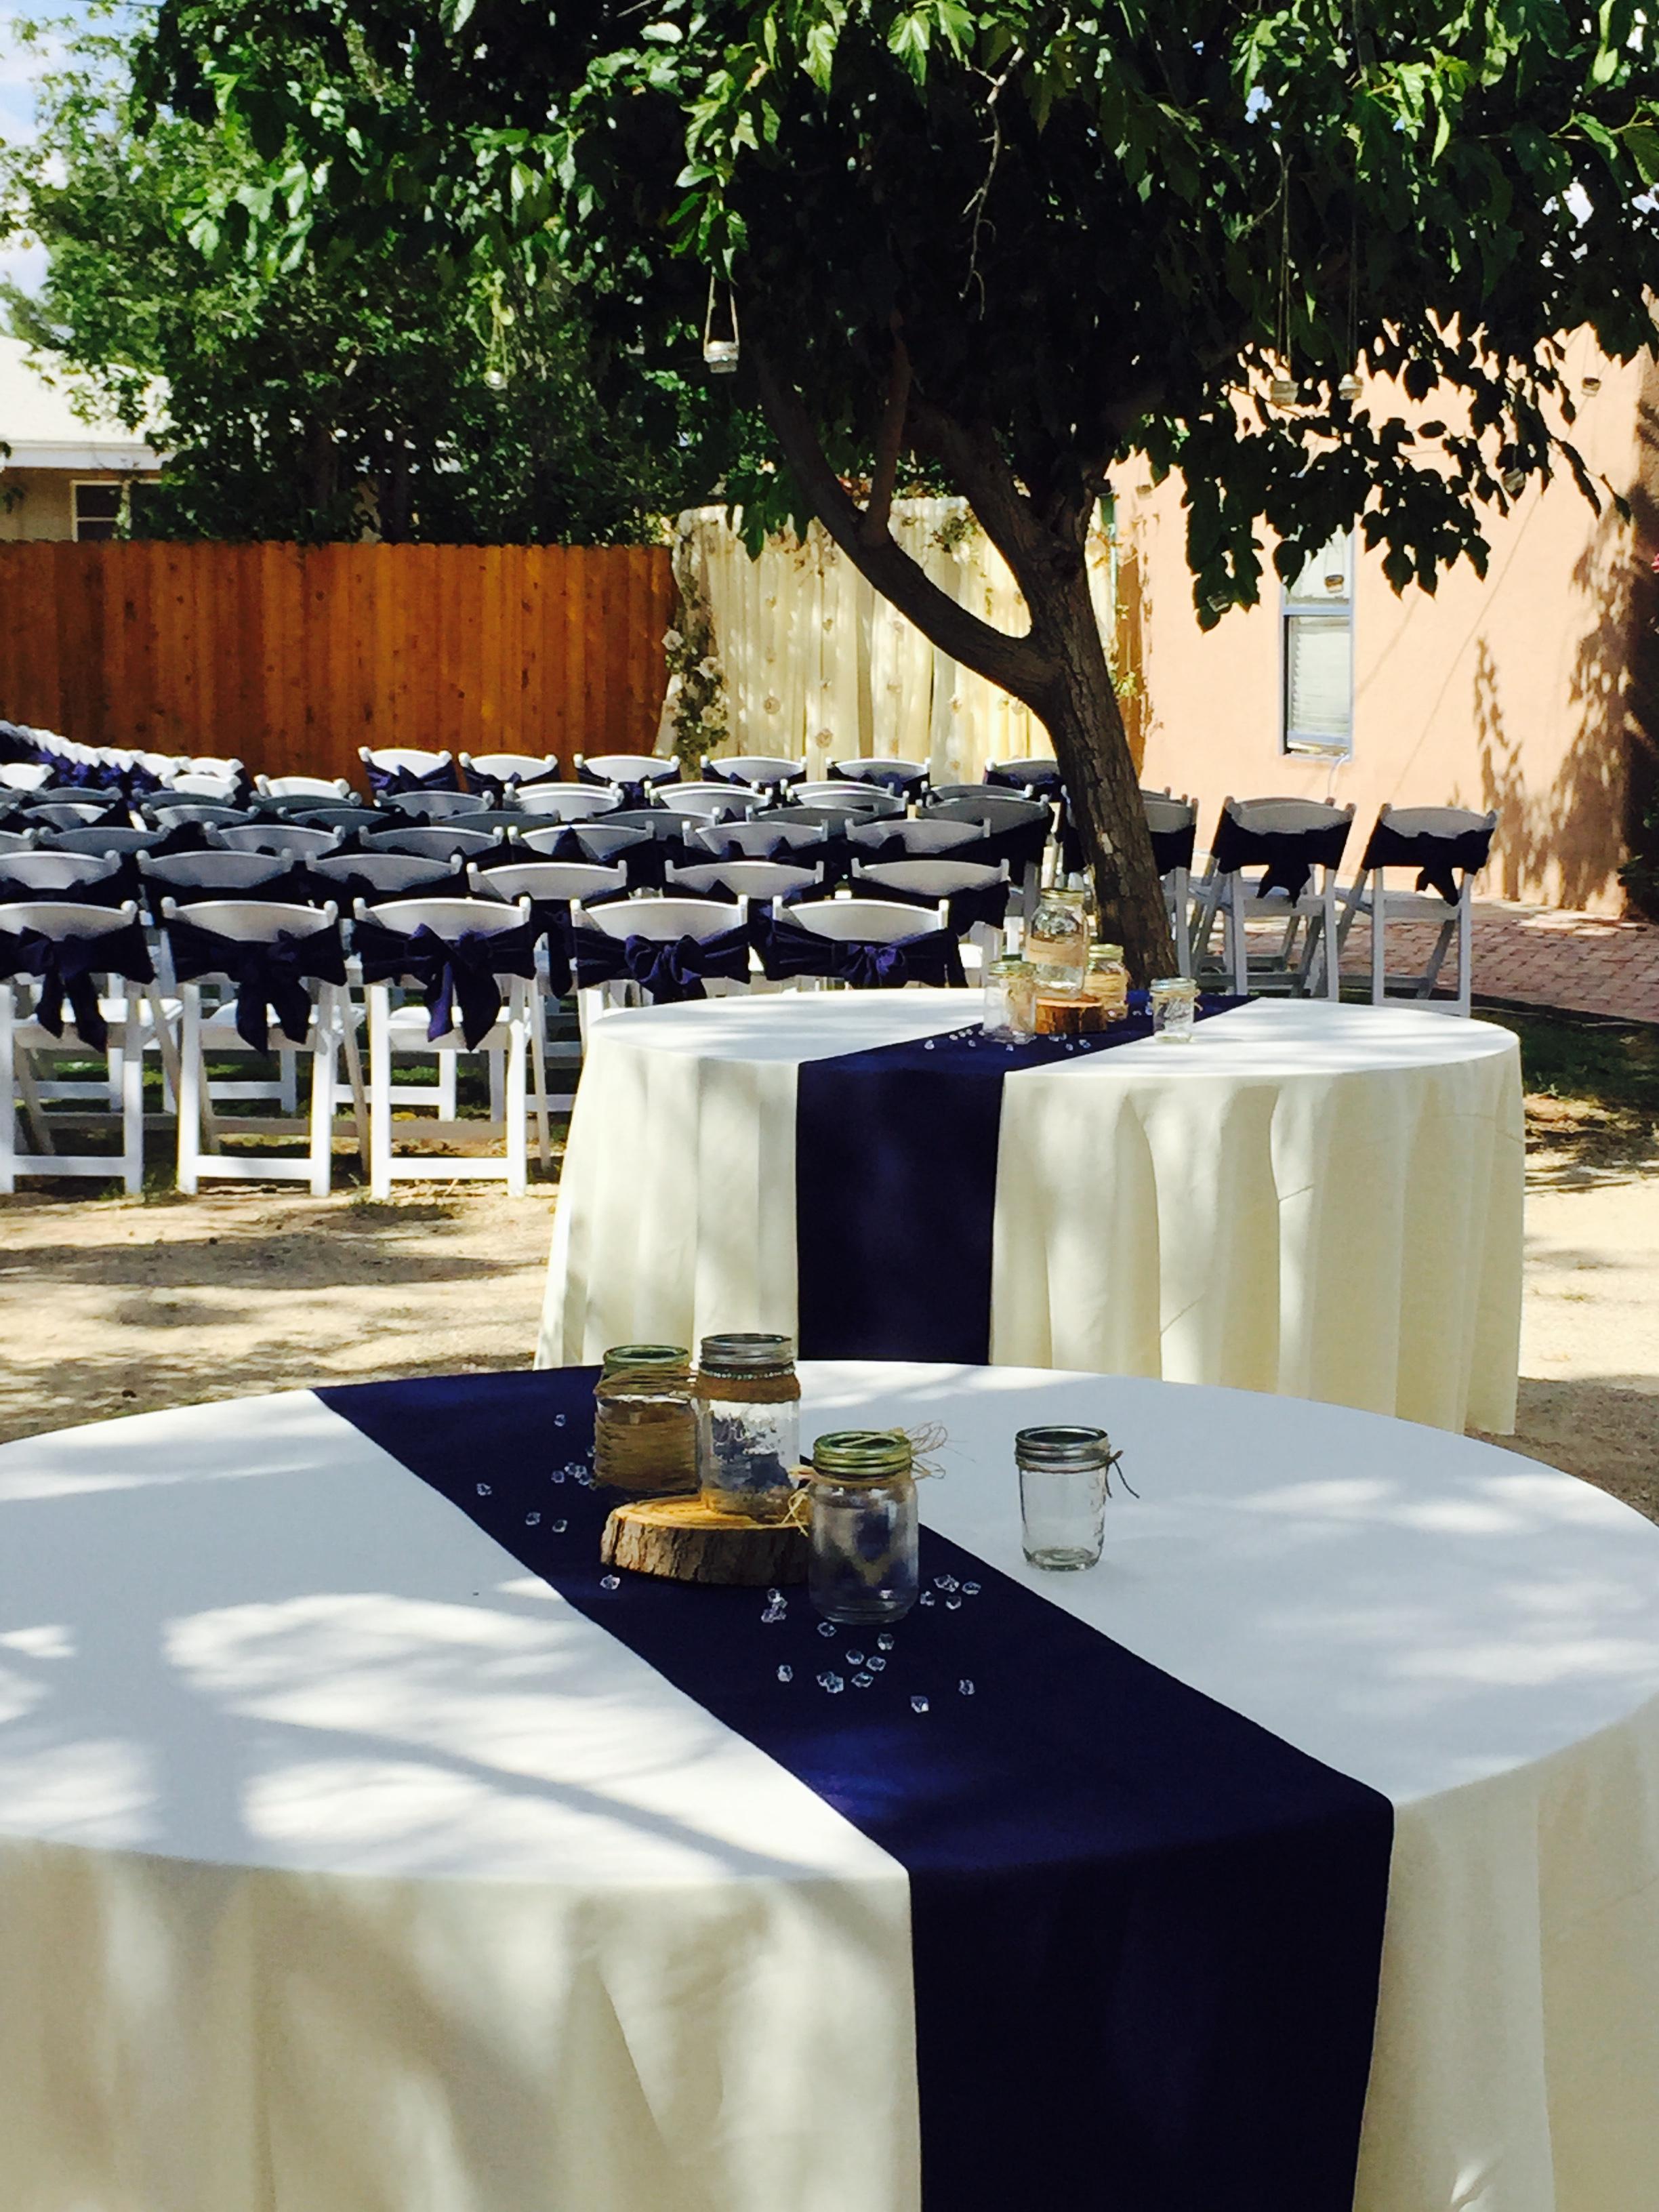 Table decor rentals in Las Cruces